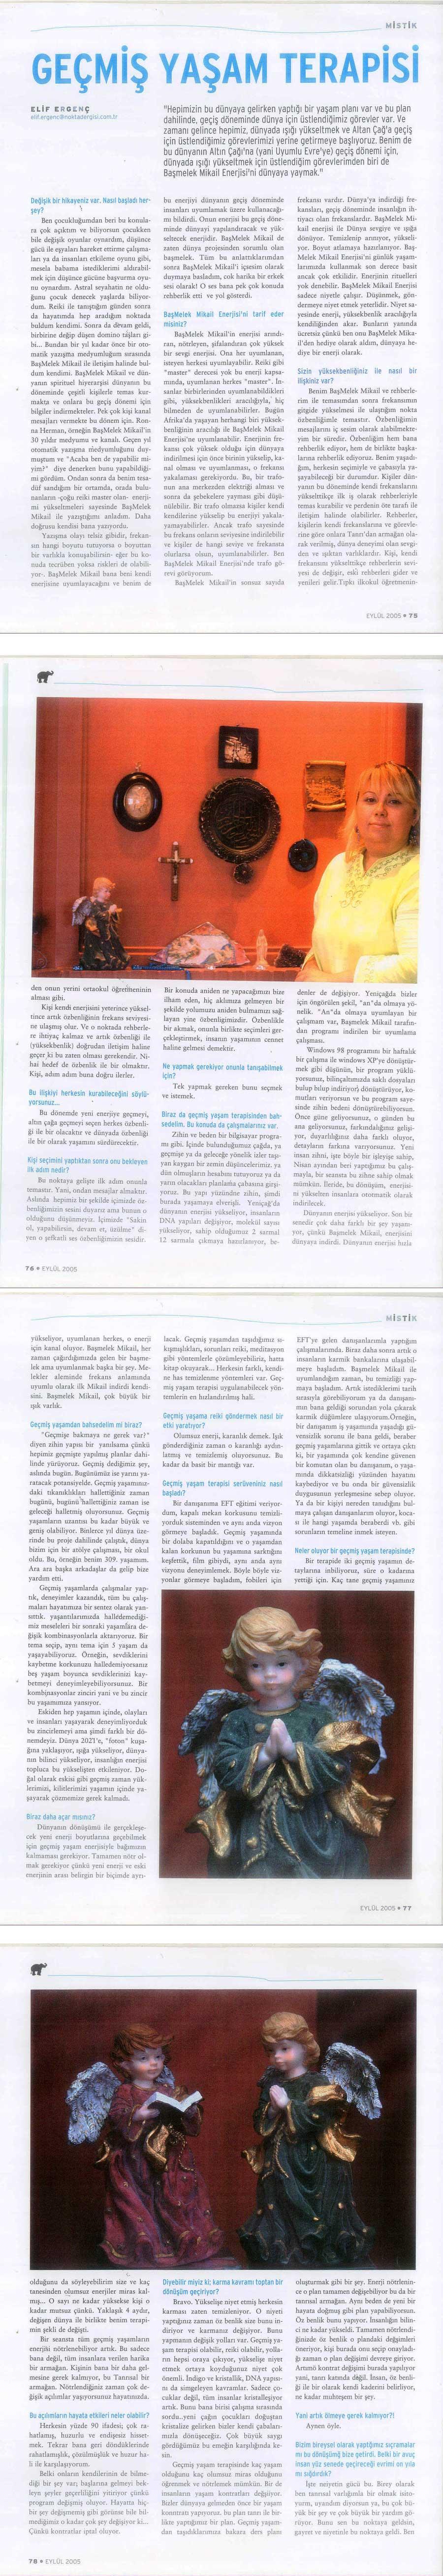 Chi-Dergisi-Gecmis-Yasam-Terapisi